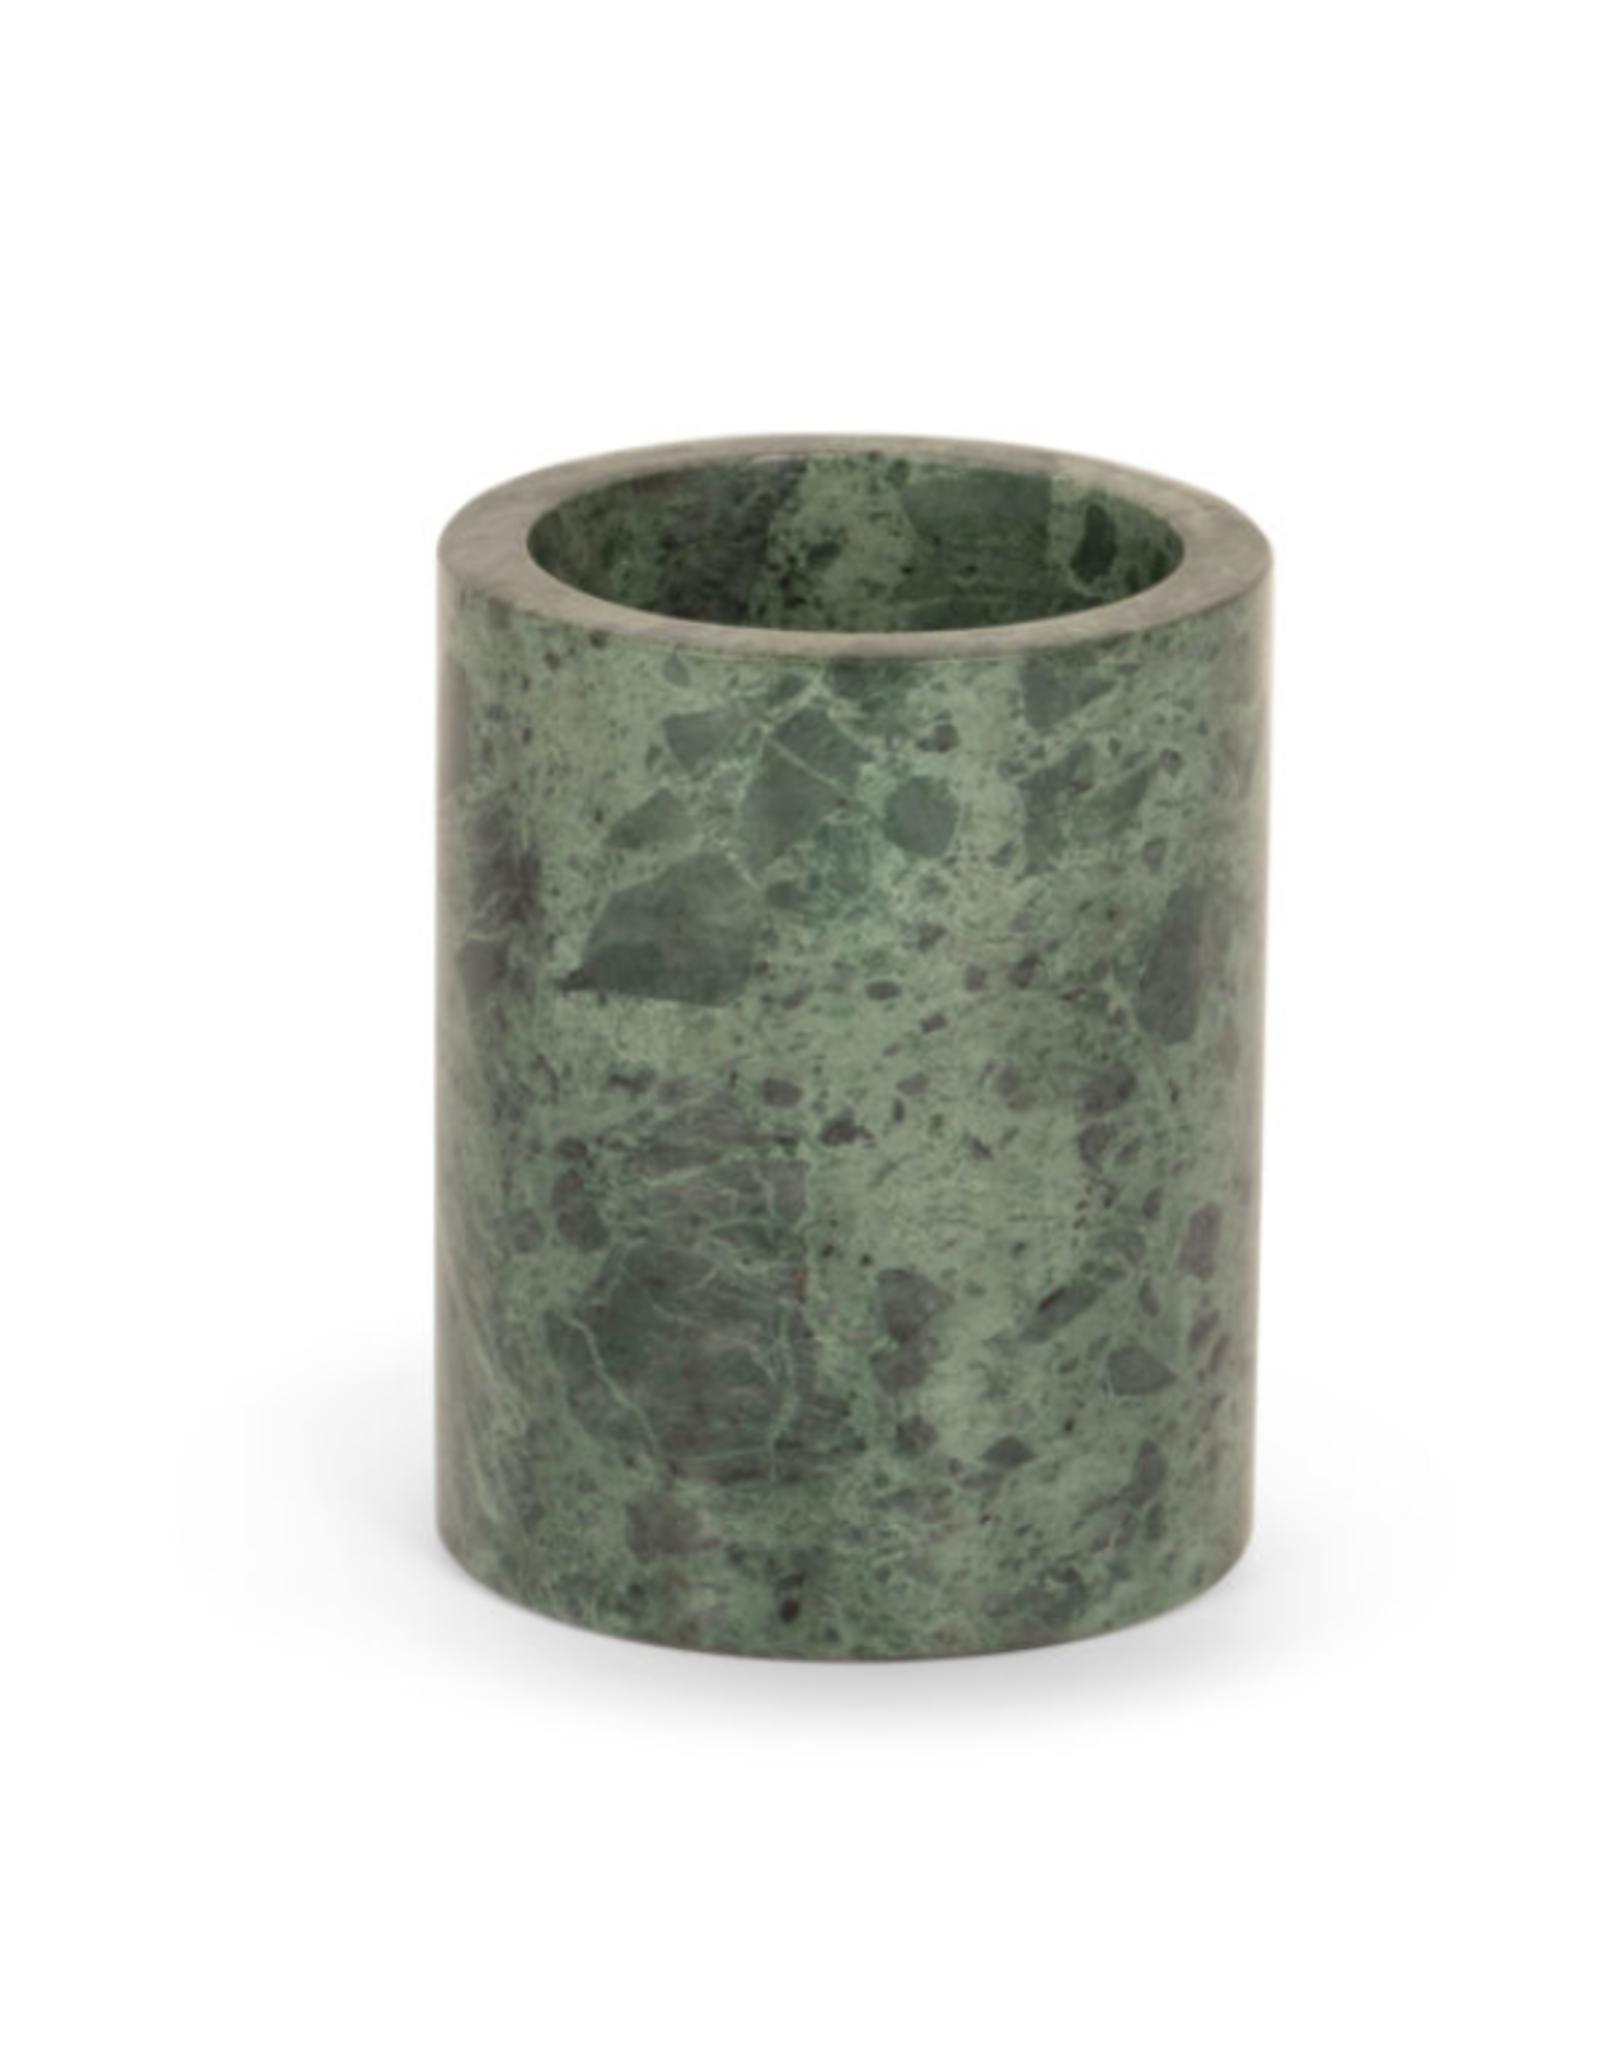 Stoned - Green Marble - Sleek - Toothbrush Holder